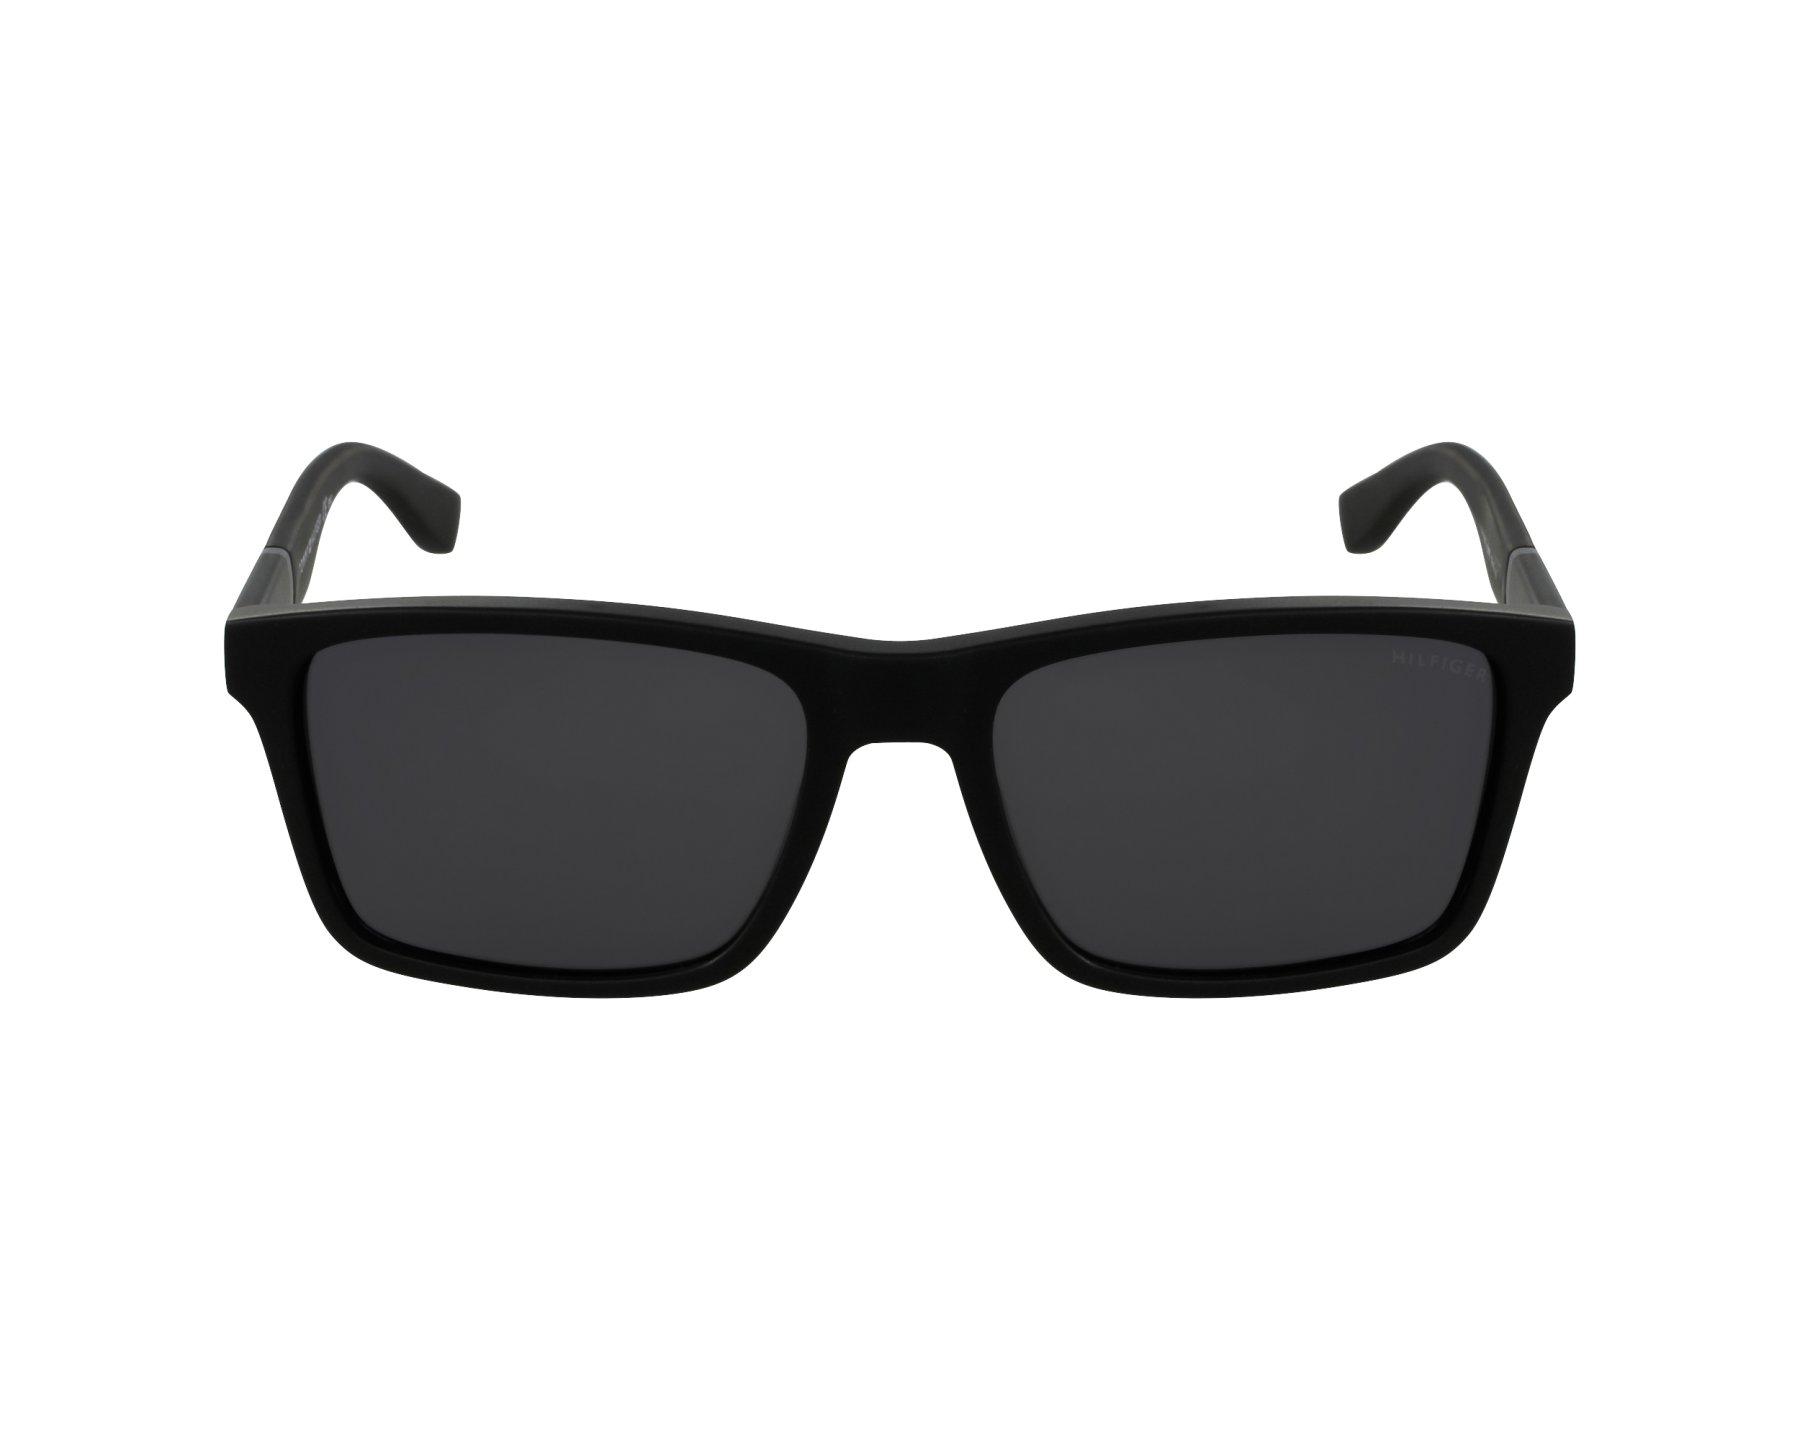 588ebc25bb0 Sunglasses Tommy Hilfiger TH-1405-S KUN P9 56-18 Black profile